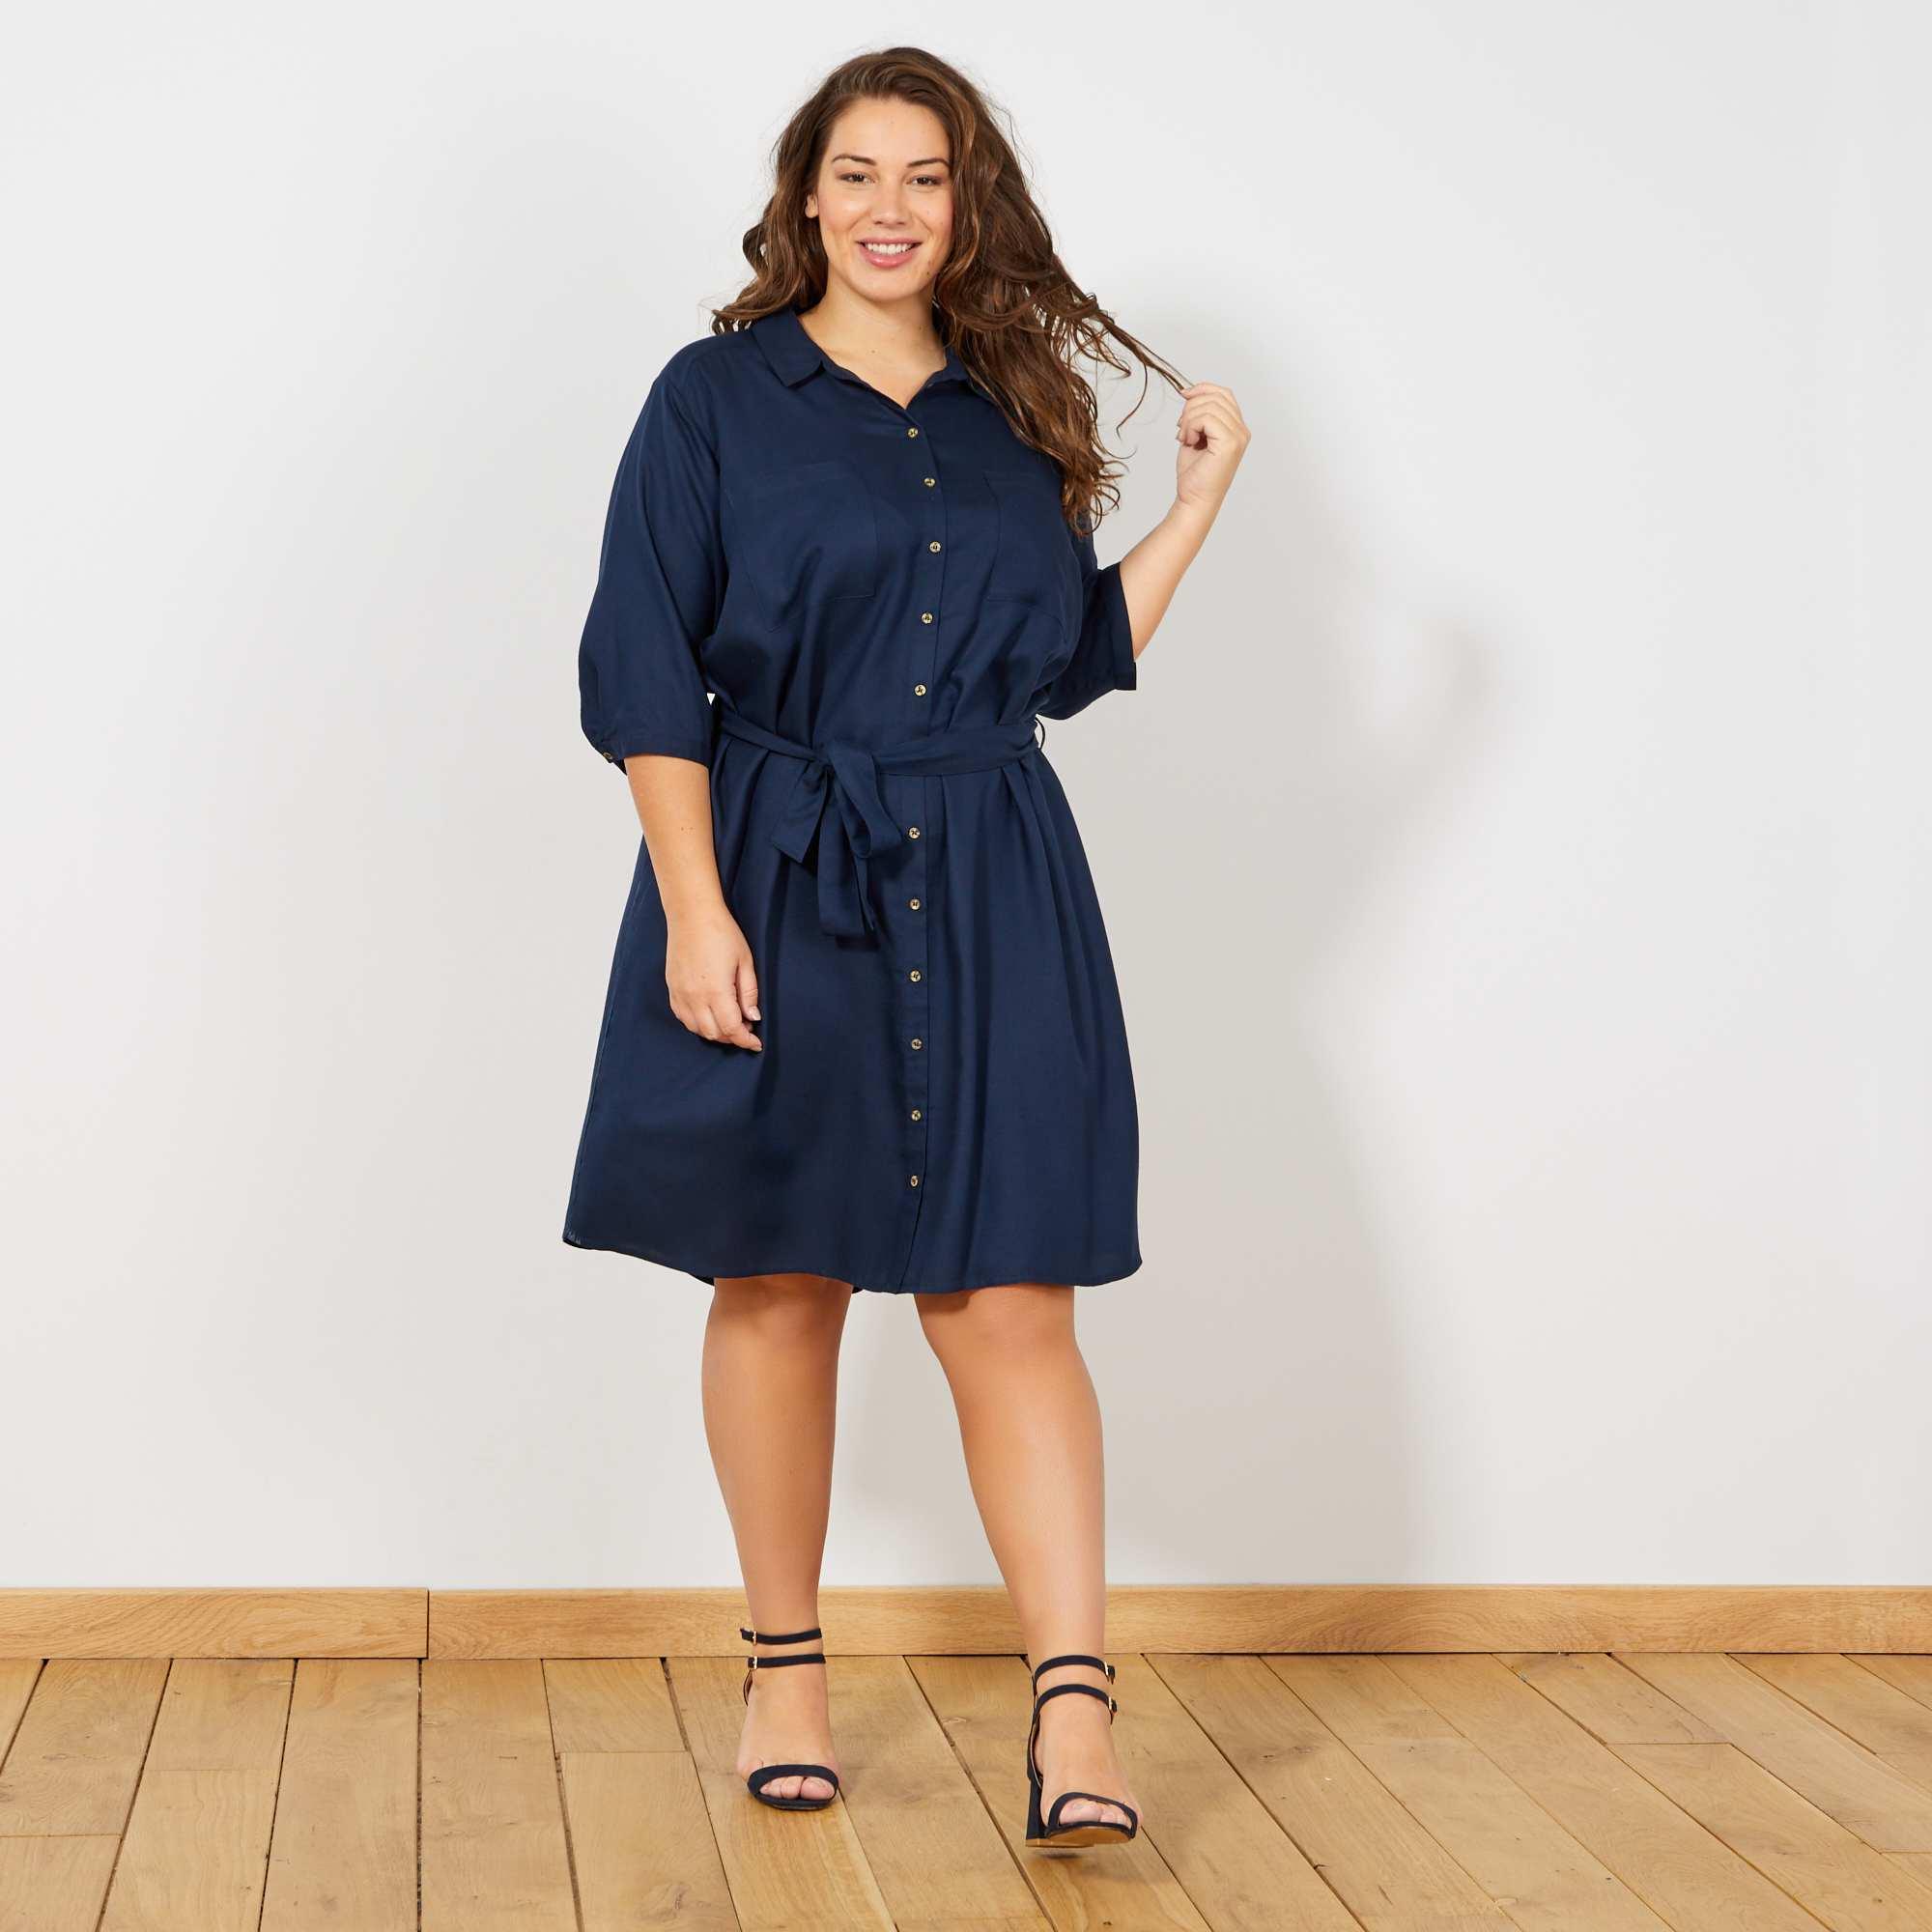 38d8558d012 Robe chemise avec ceinture Grande taille femme - bleu marine - Kiabi ...